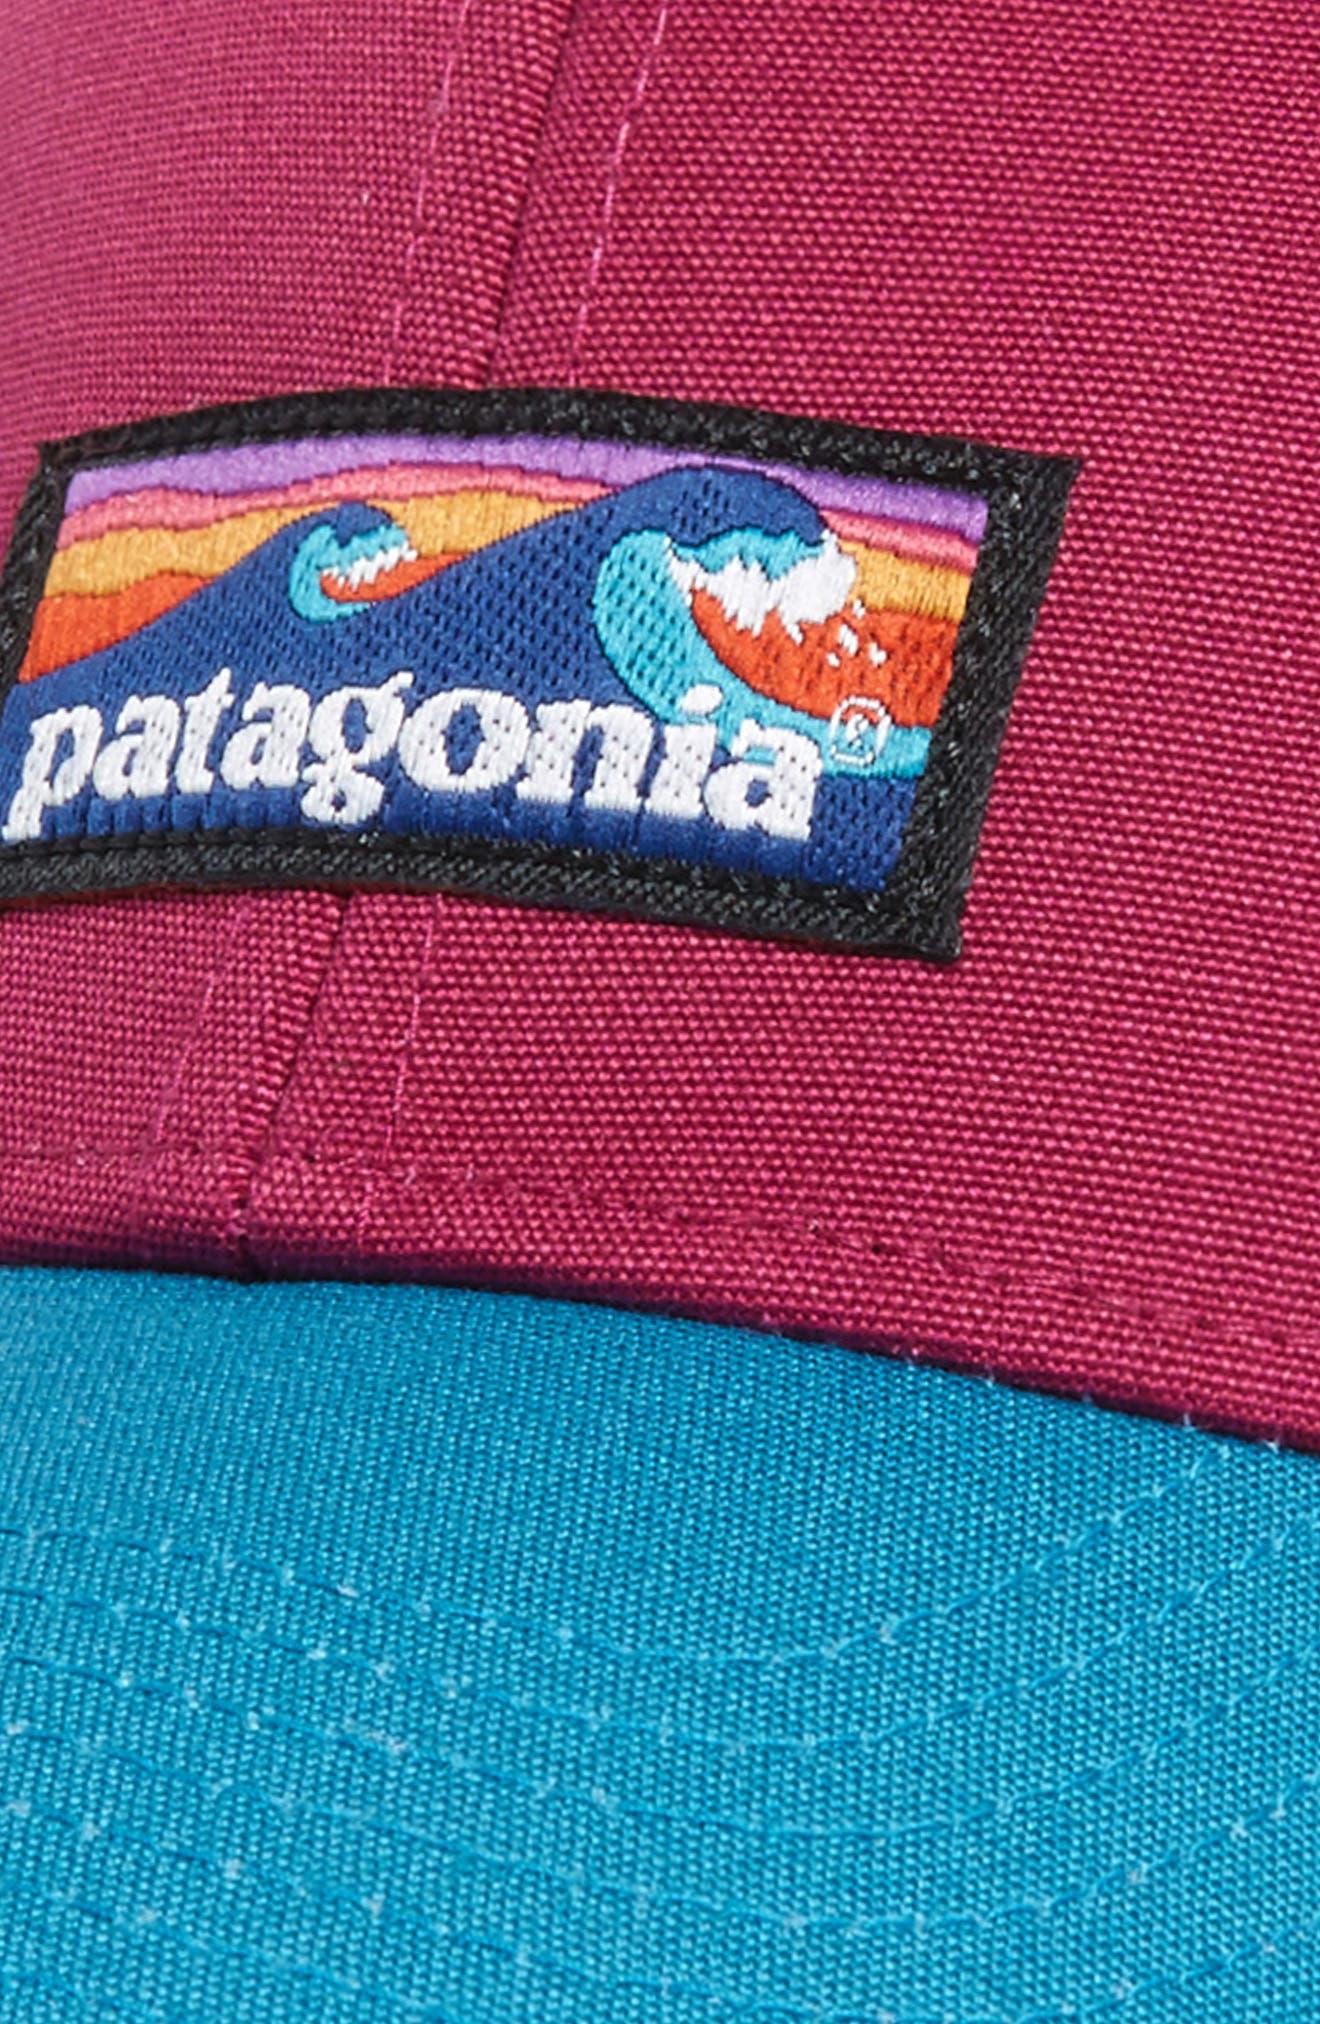 Alternate Image 3  - Patagonia Board Short Trucker Hat